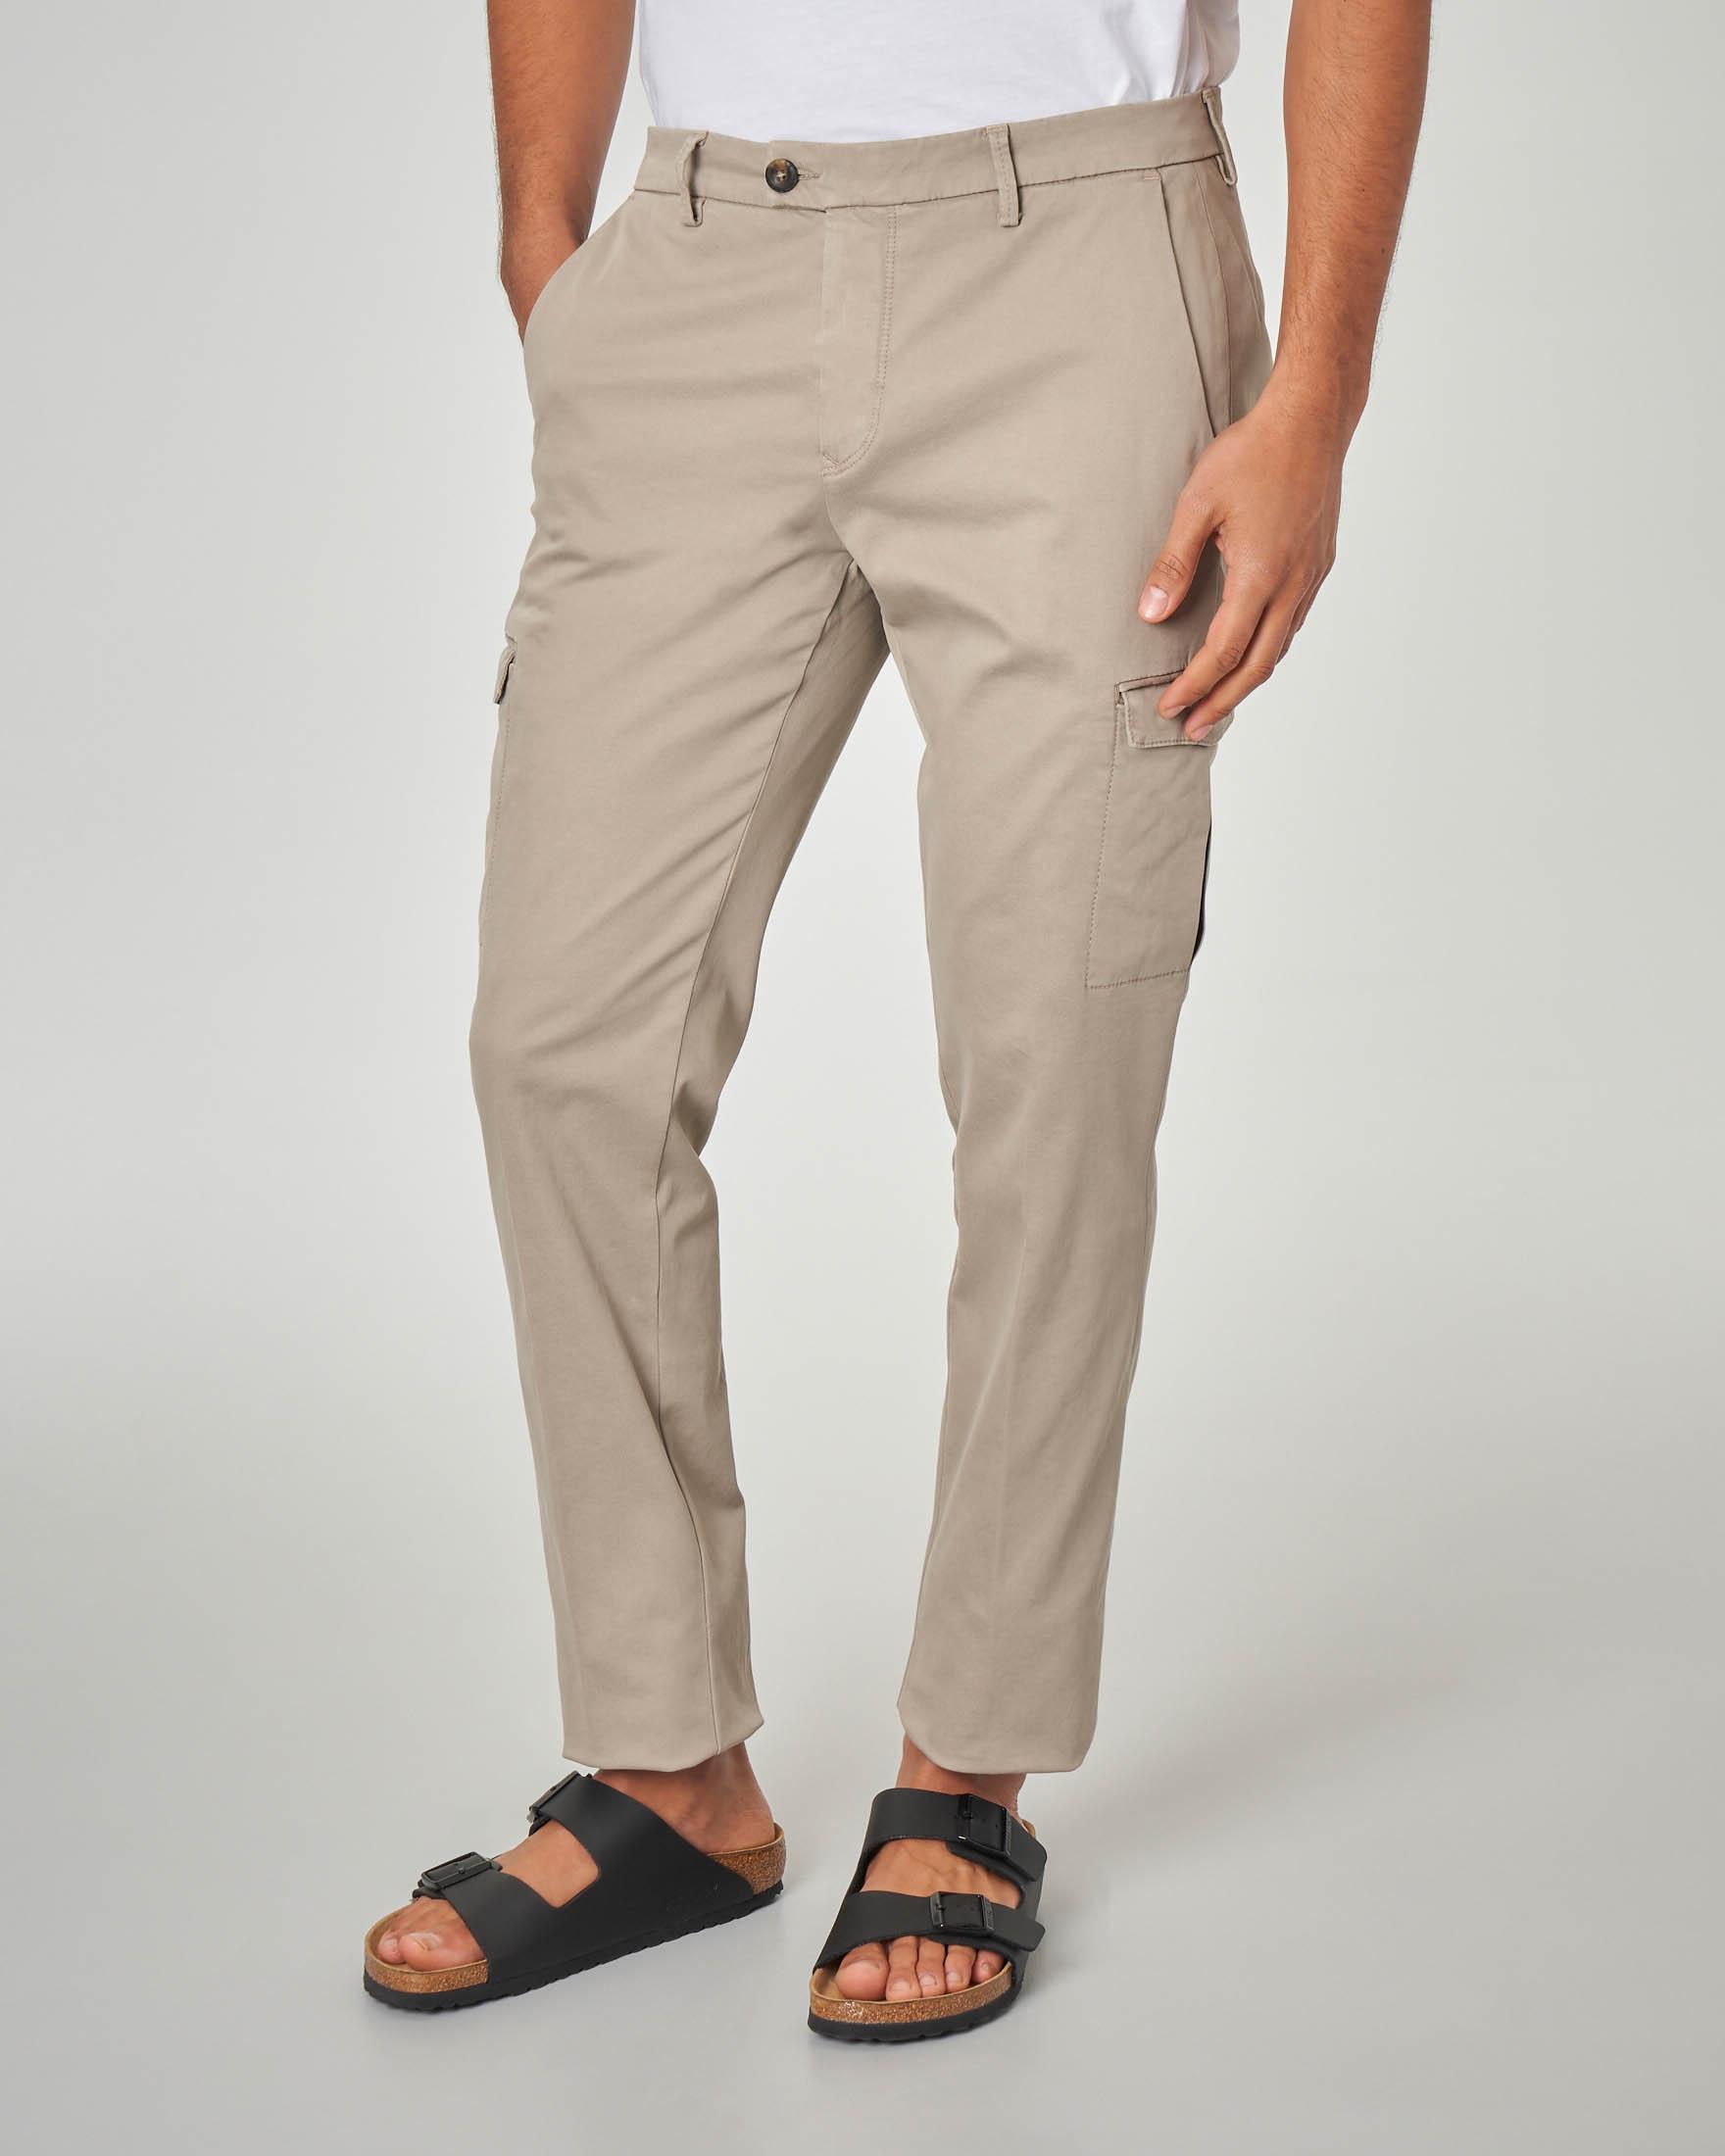 Pantalone beige tasconato